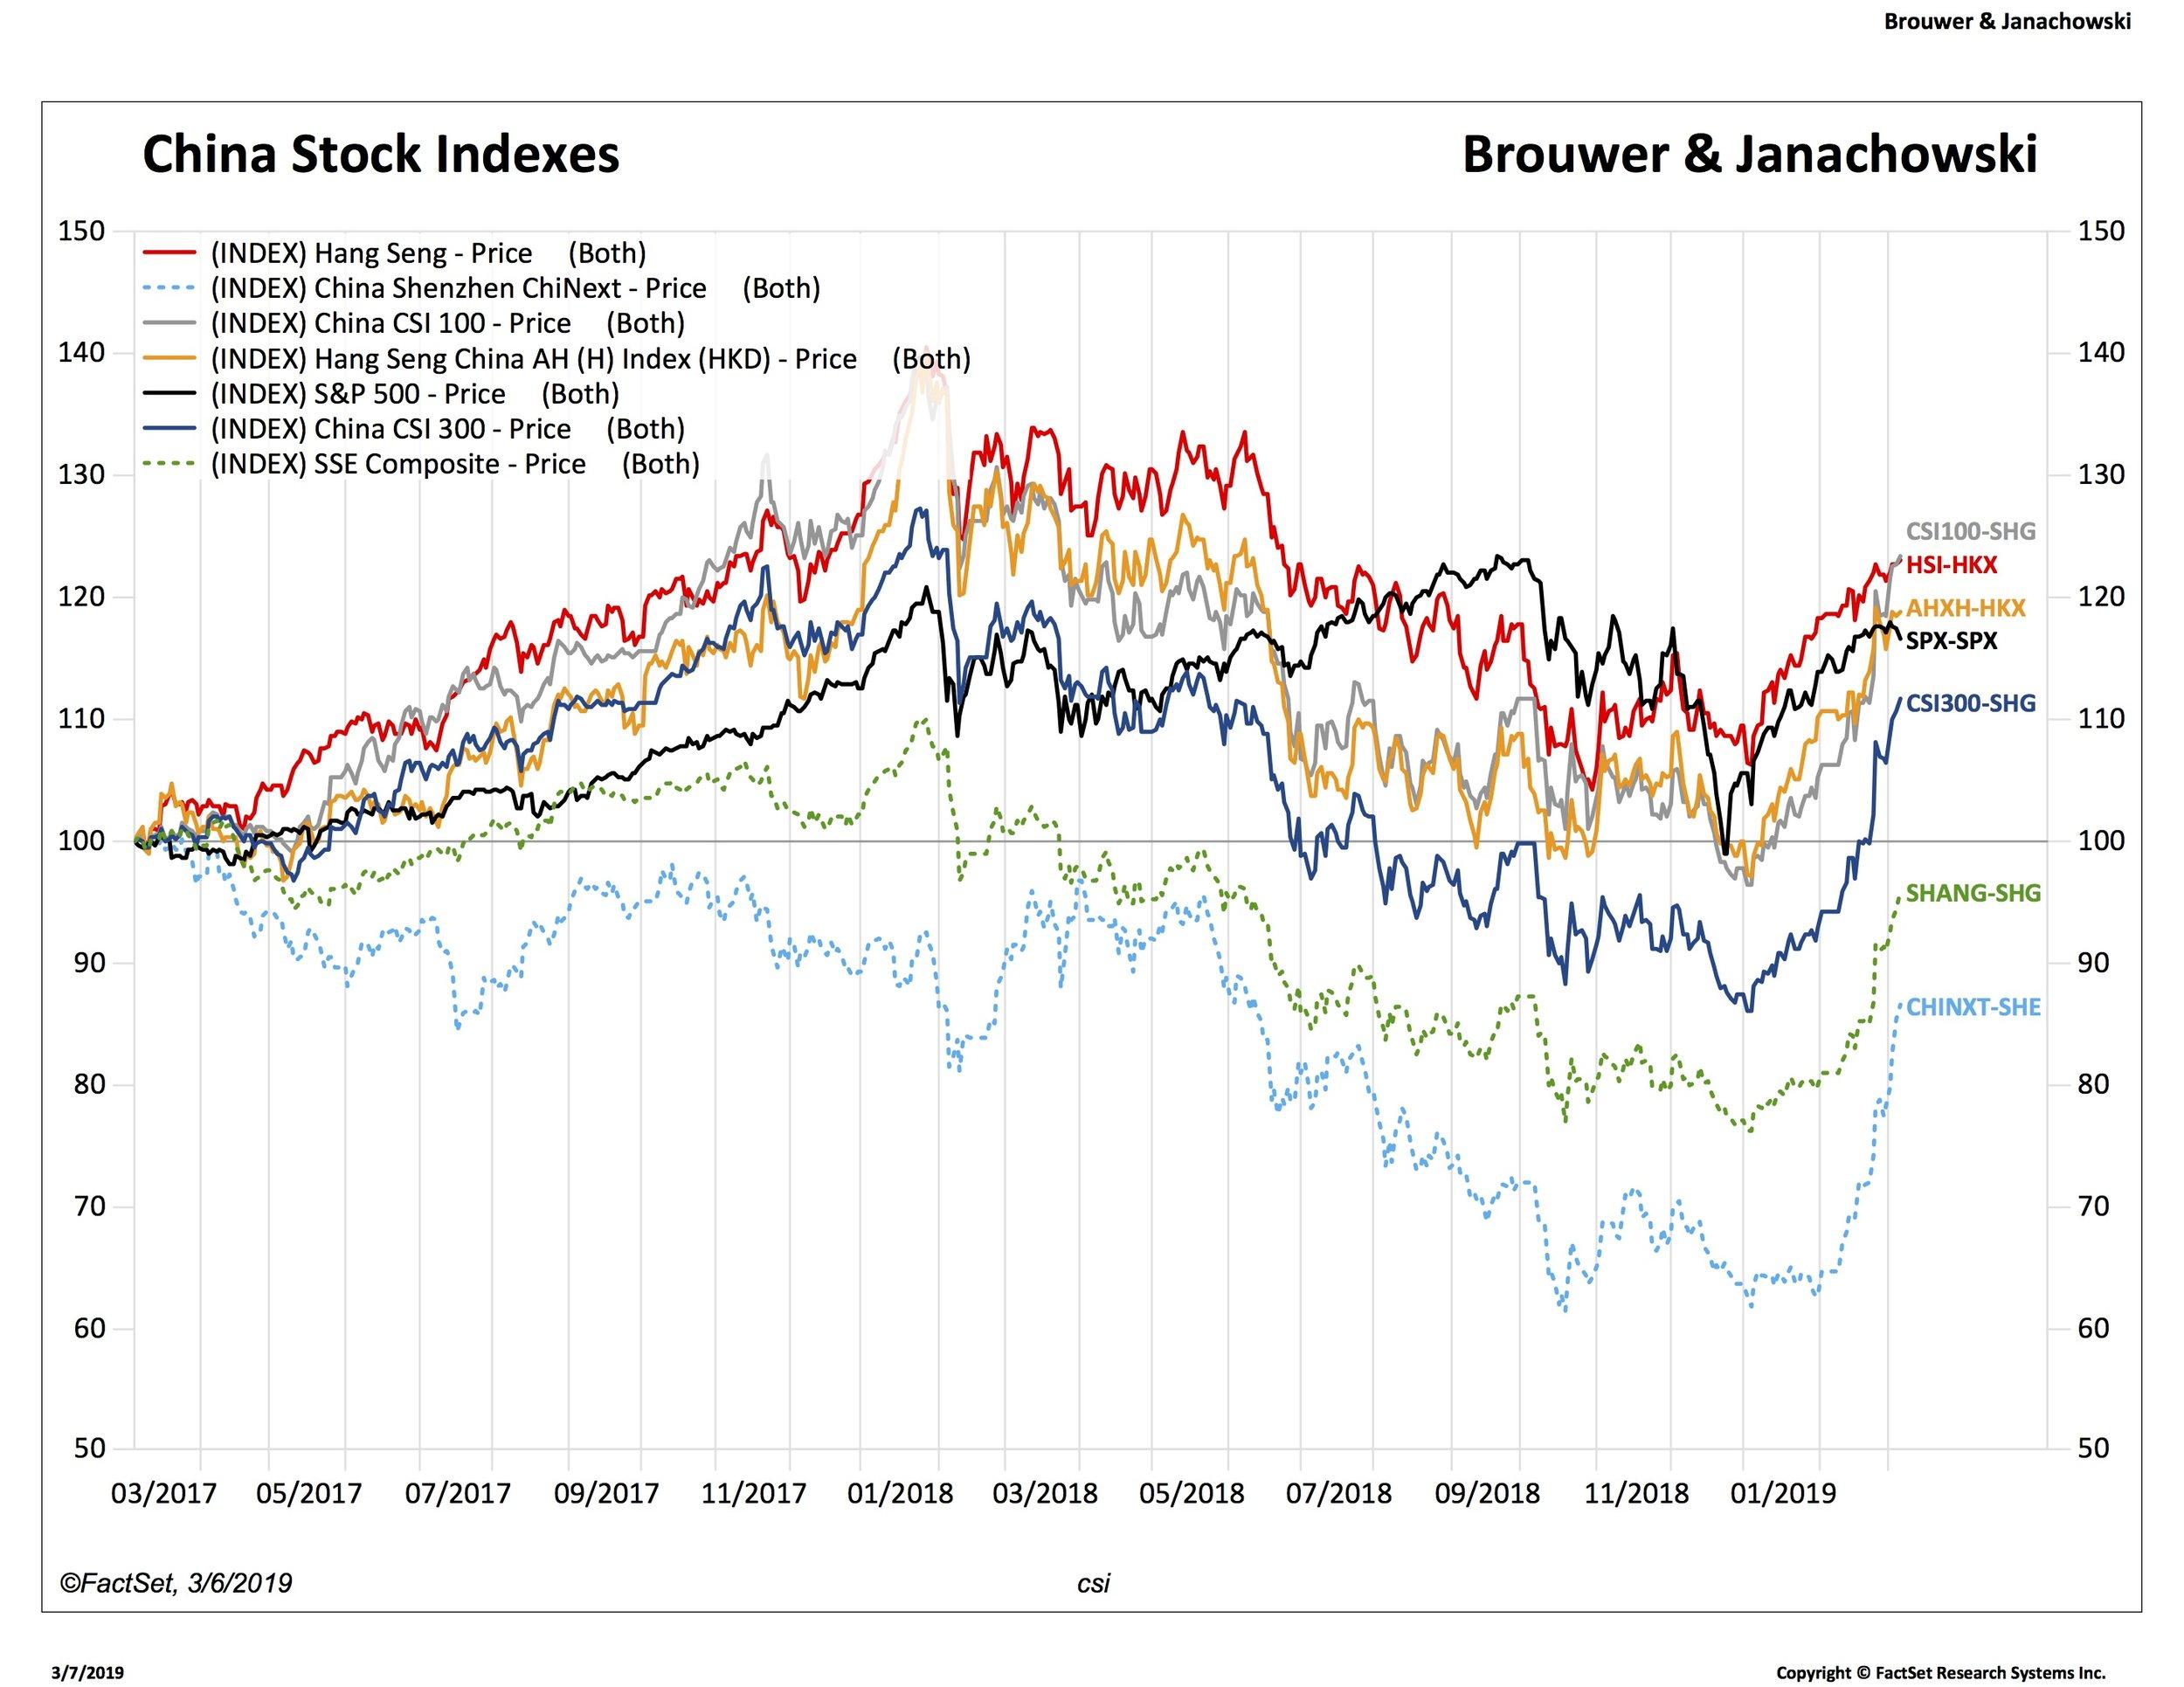 2. China stock indexes_HSI-HKX.jpg